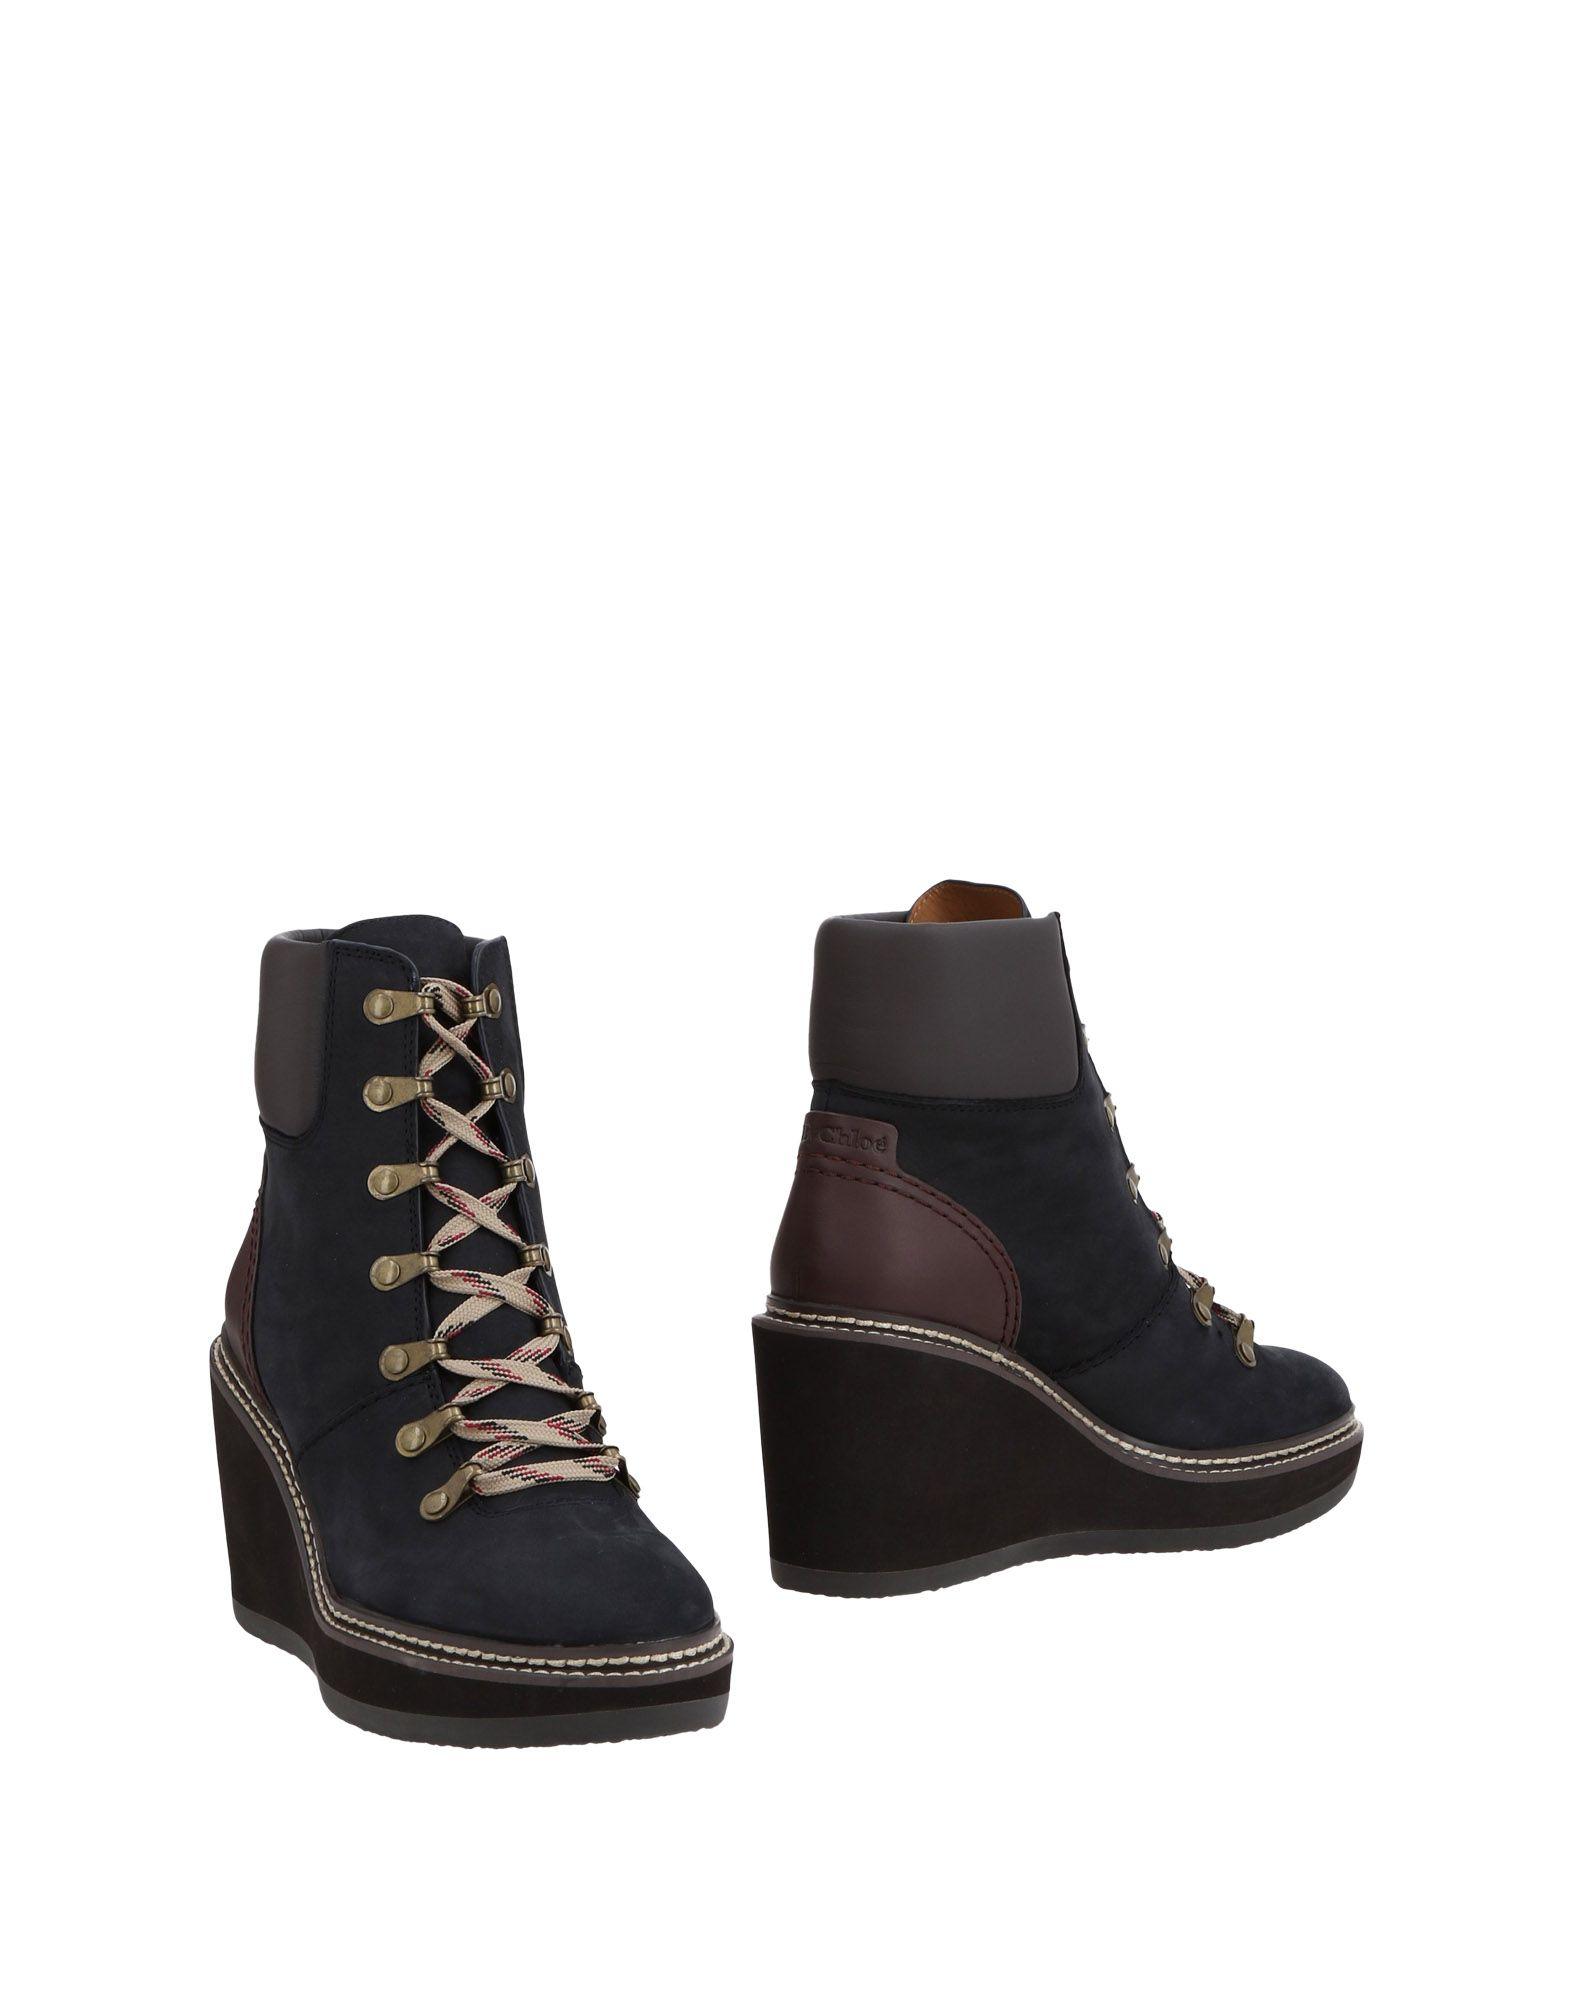 Rabatt Schuhe See By Chloé Stiefelette Damen  11483467CG